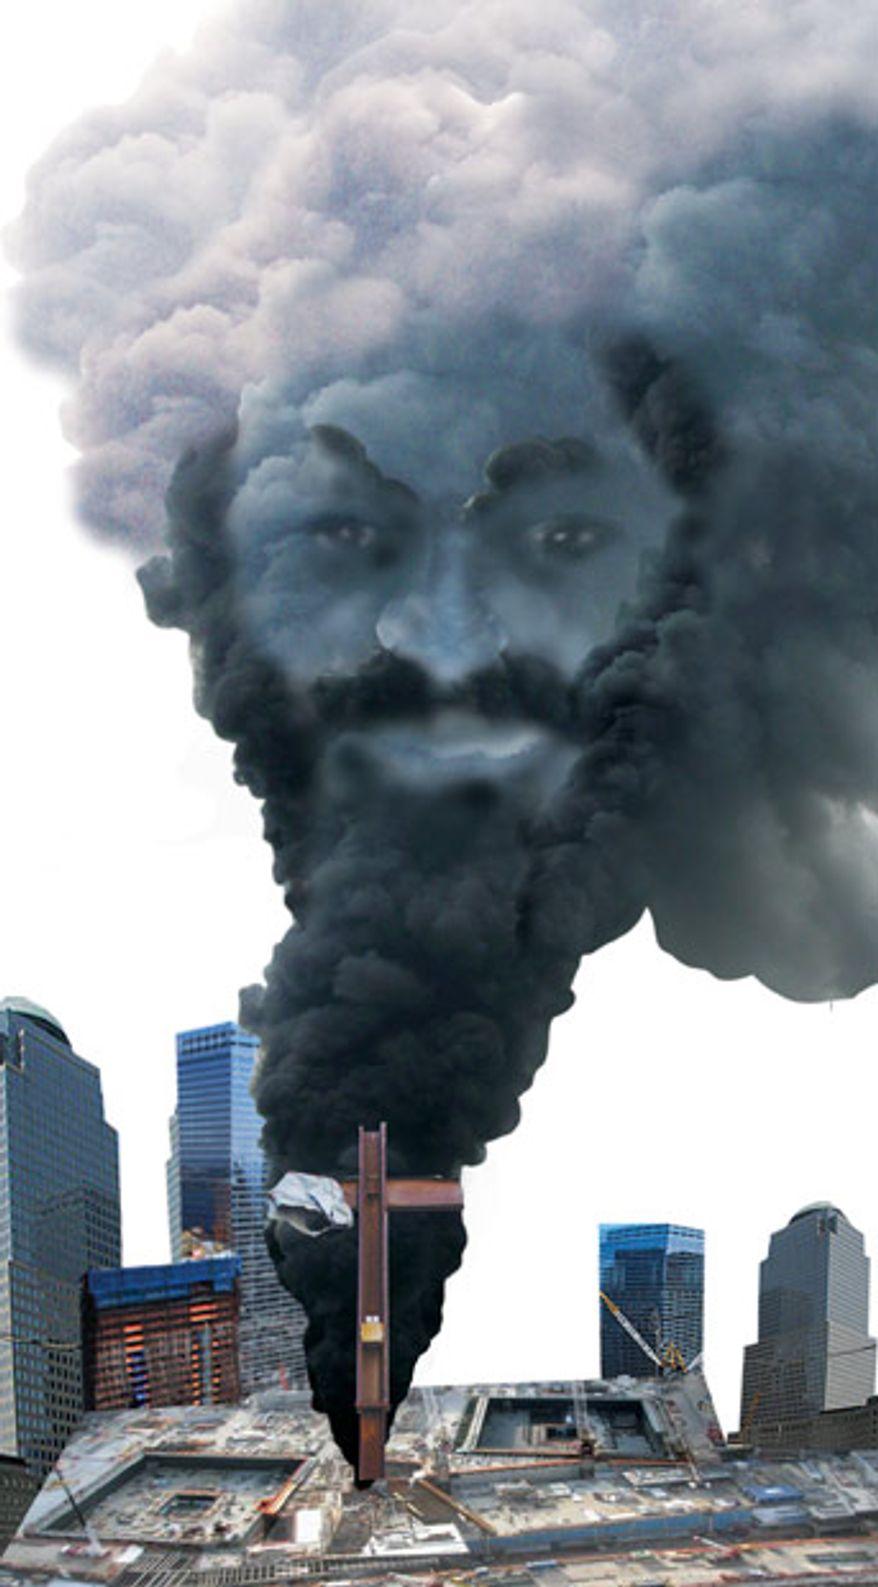 Illustration: Osama's Ground Zero by Linas Garsys for The Washington Times